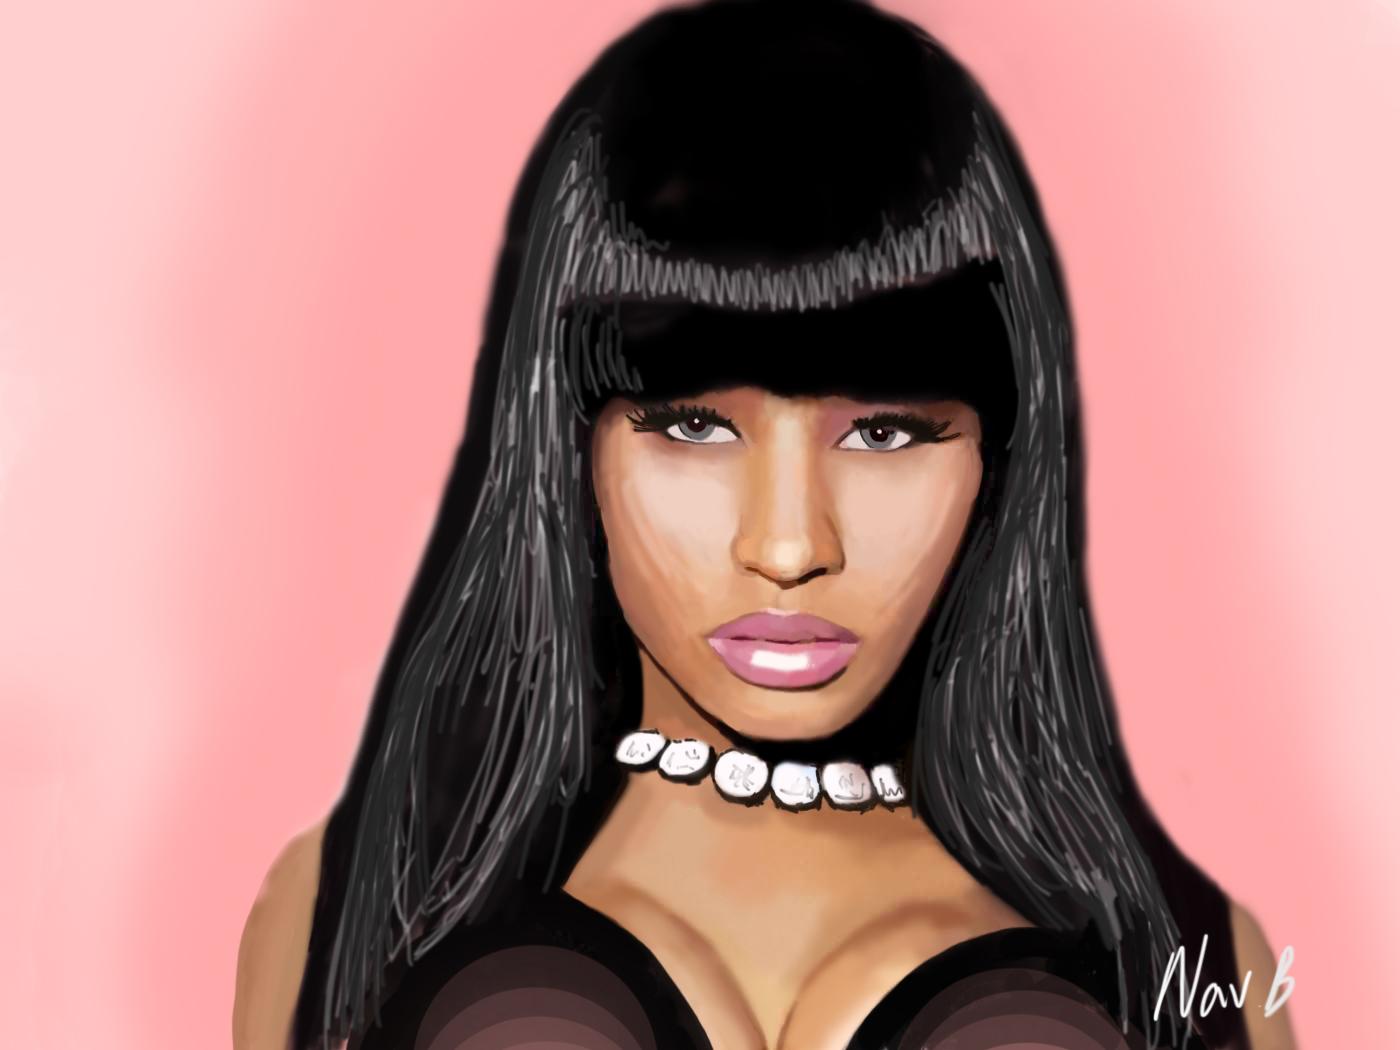 Nicki Minaj 7 Year Old  Nude Naked Pussy Slip Celebrity-7398